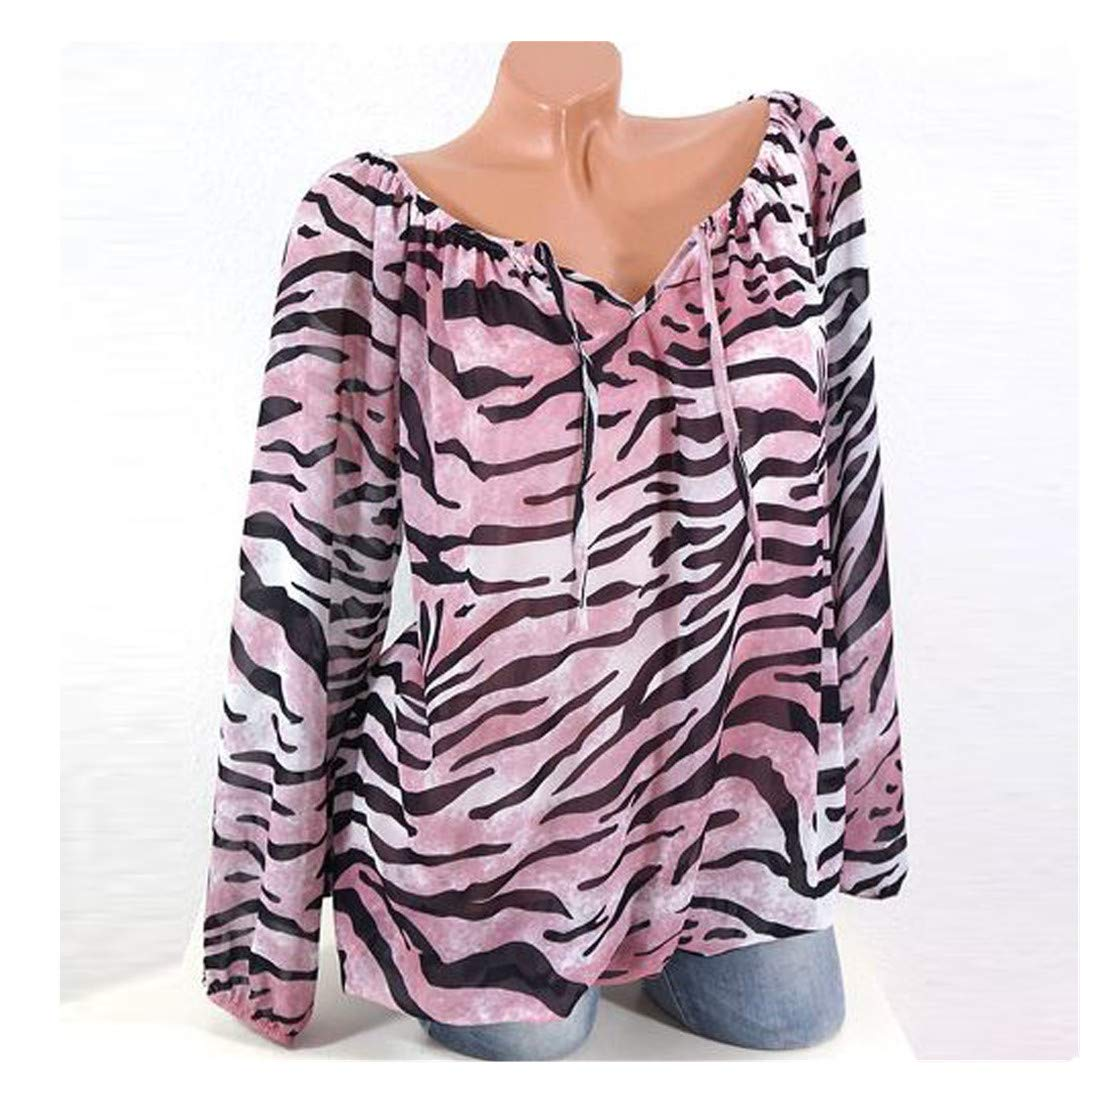 Womens Tops Clearance - WEUIE Womens Casual Long Sleeve Blue Stripe Button T-Shirts Irregular Tops Blouse(L, Pink)